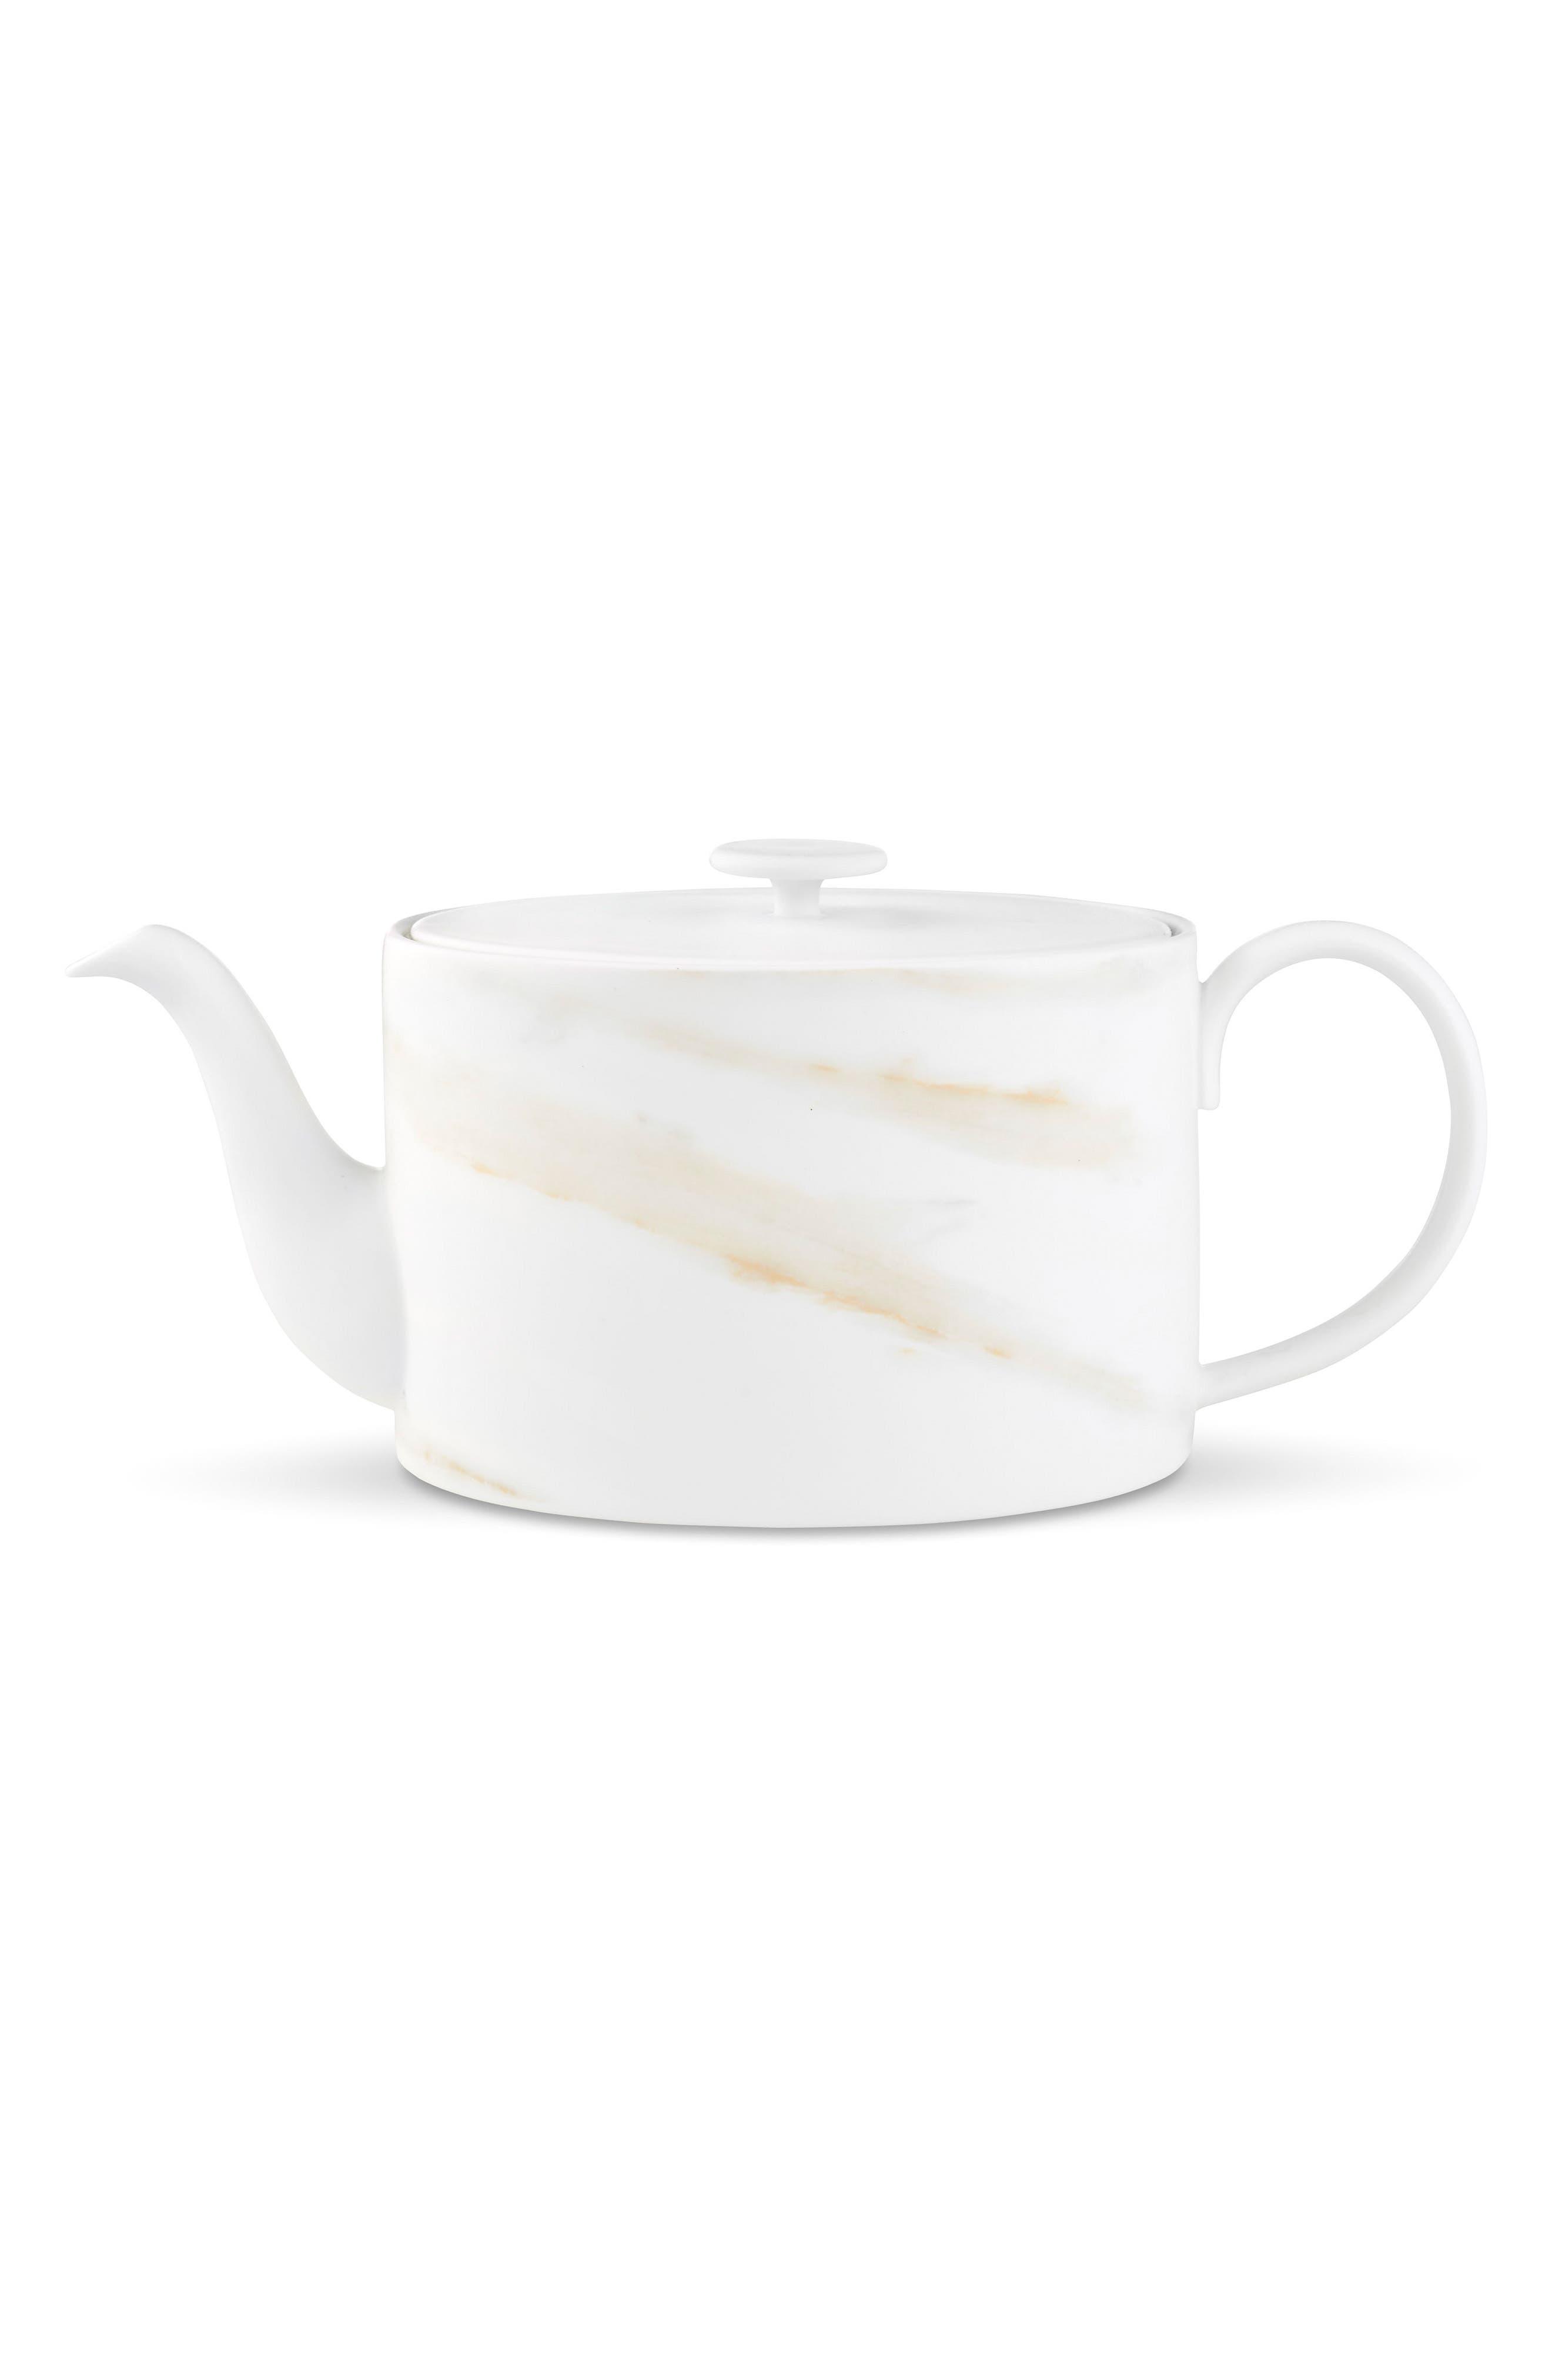 x Wedgwood Venato Imperial Teapot,                         Main,                         color, White